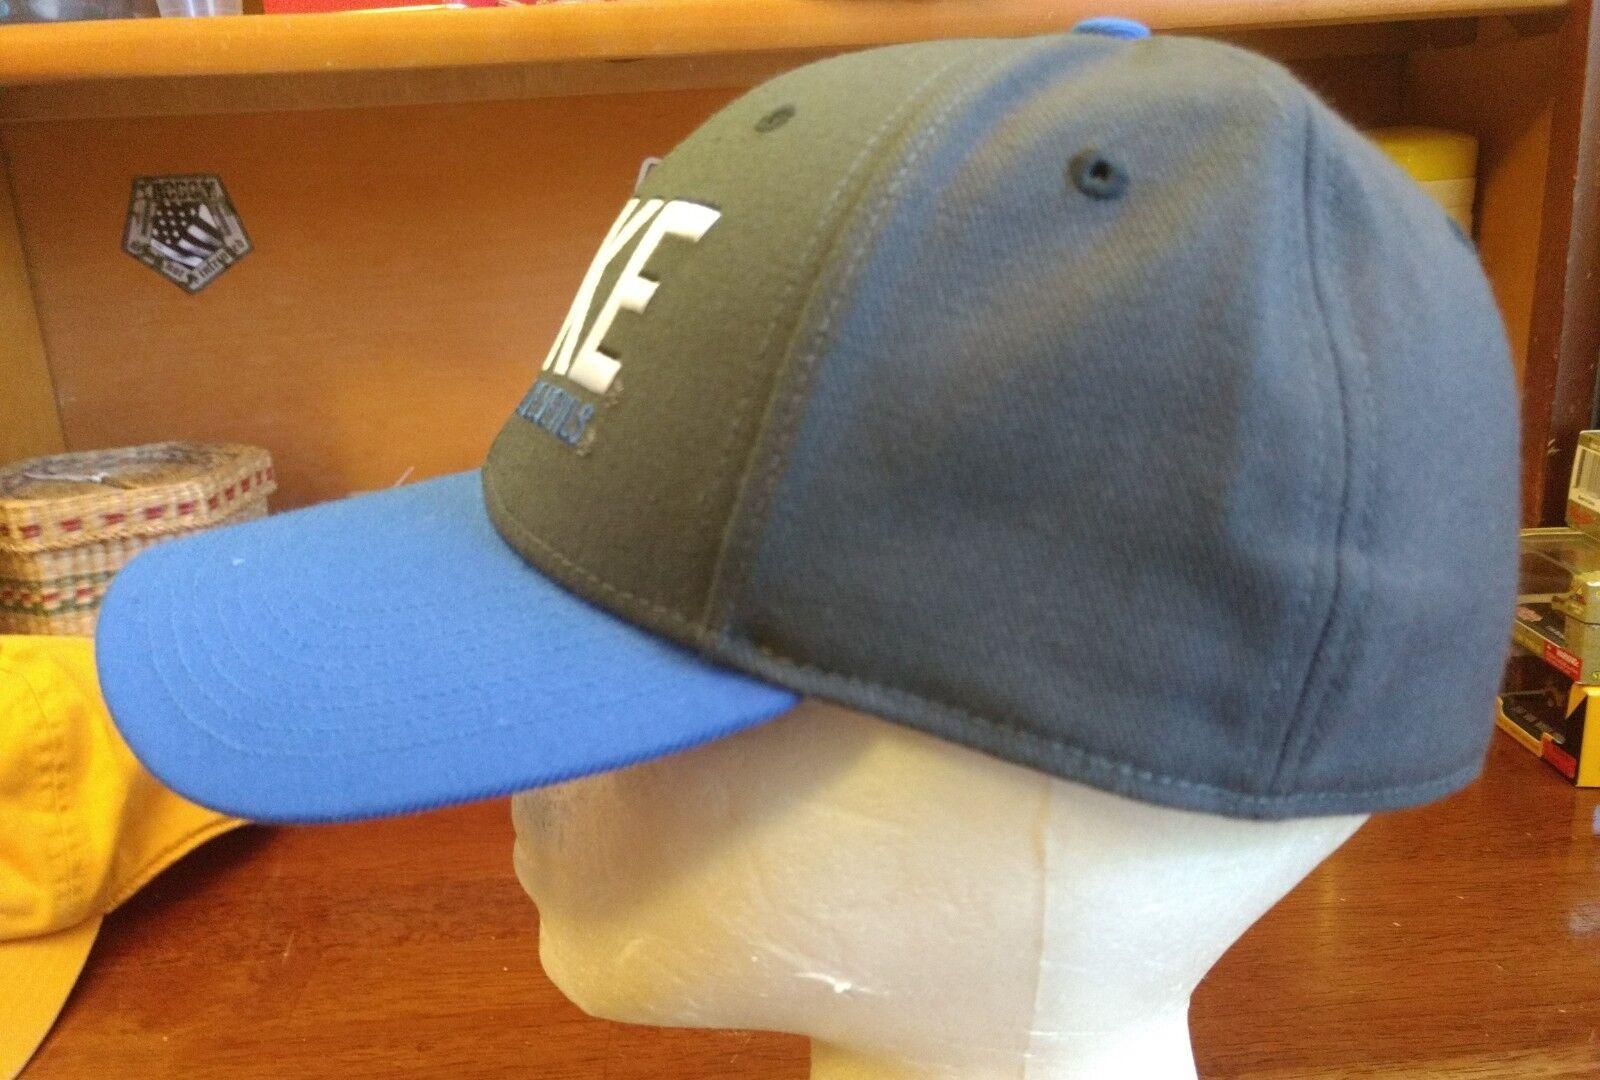 newest e059c e44d5 ... order nike duke blue devils legacy hat 91 dri fit one hat legacy d41dd5  d9b99 a6f40